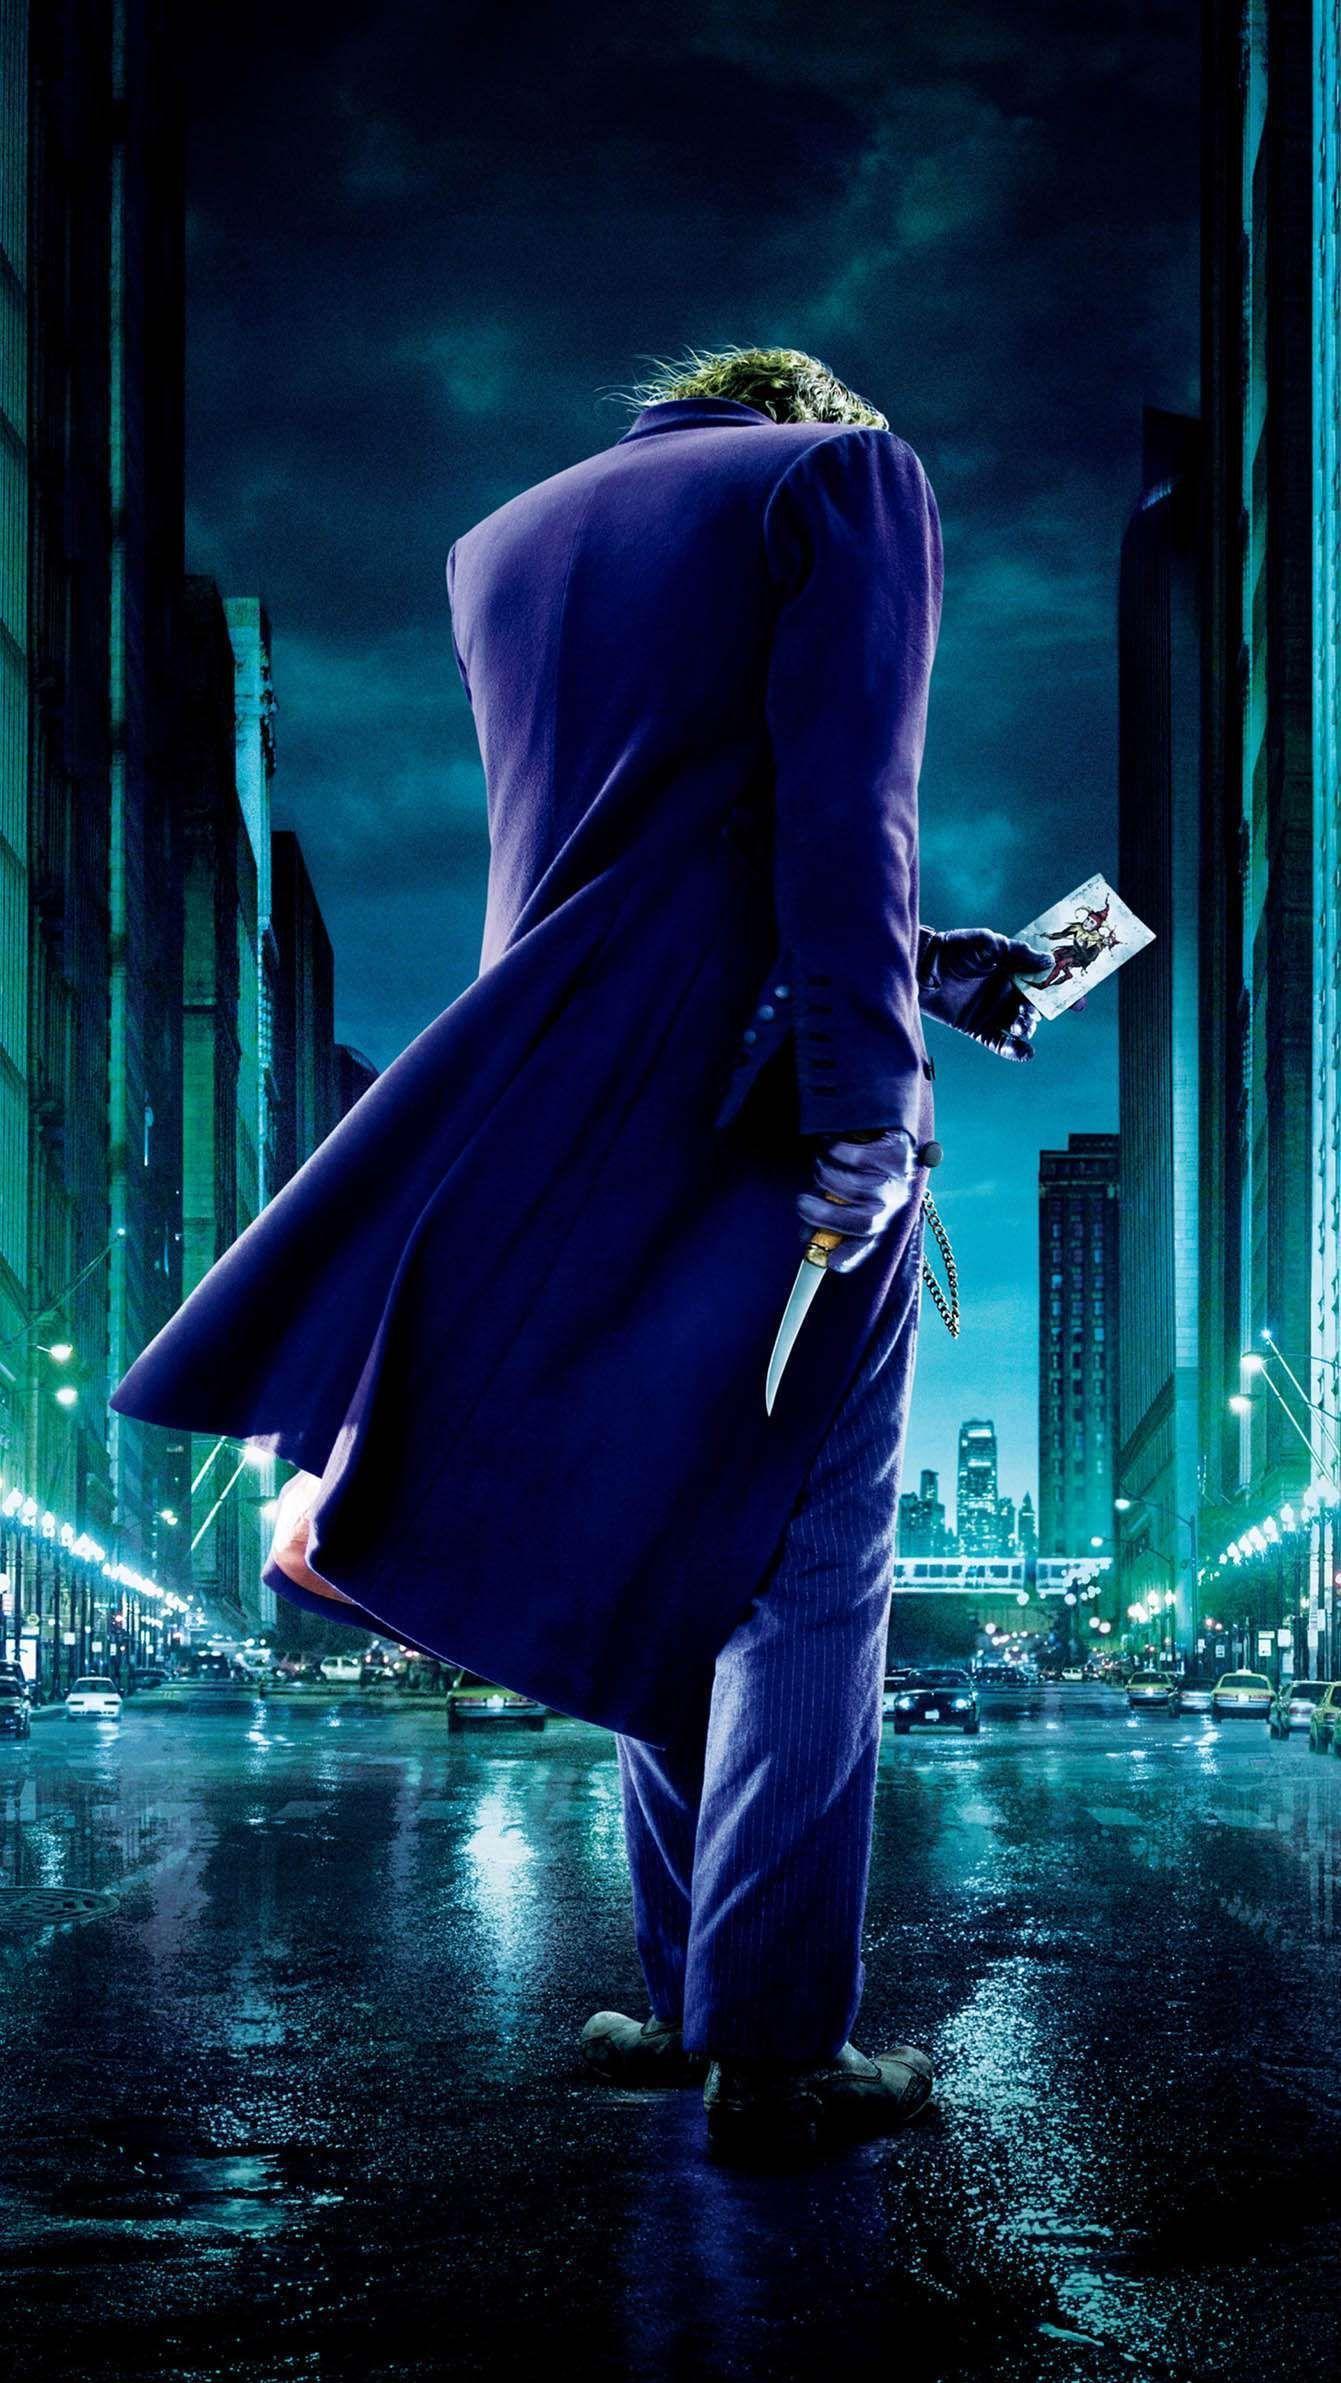 Joker Purple And Green Photo Joker Hd Wallpaper Hd Batman Wallpaper Joker Wallpapers